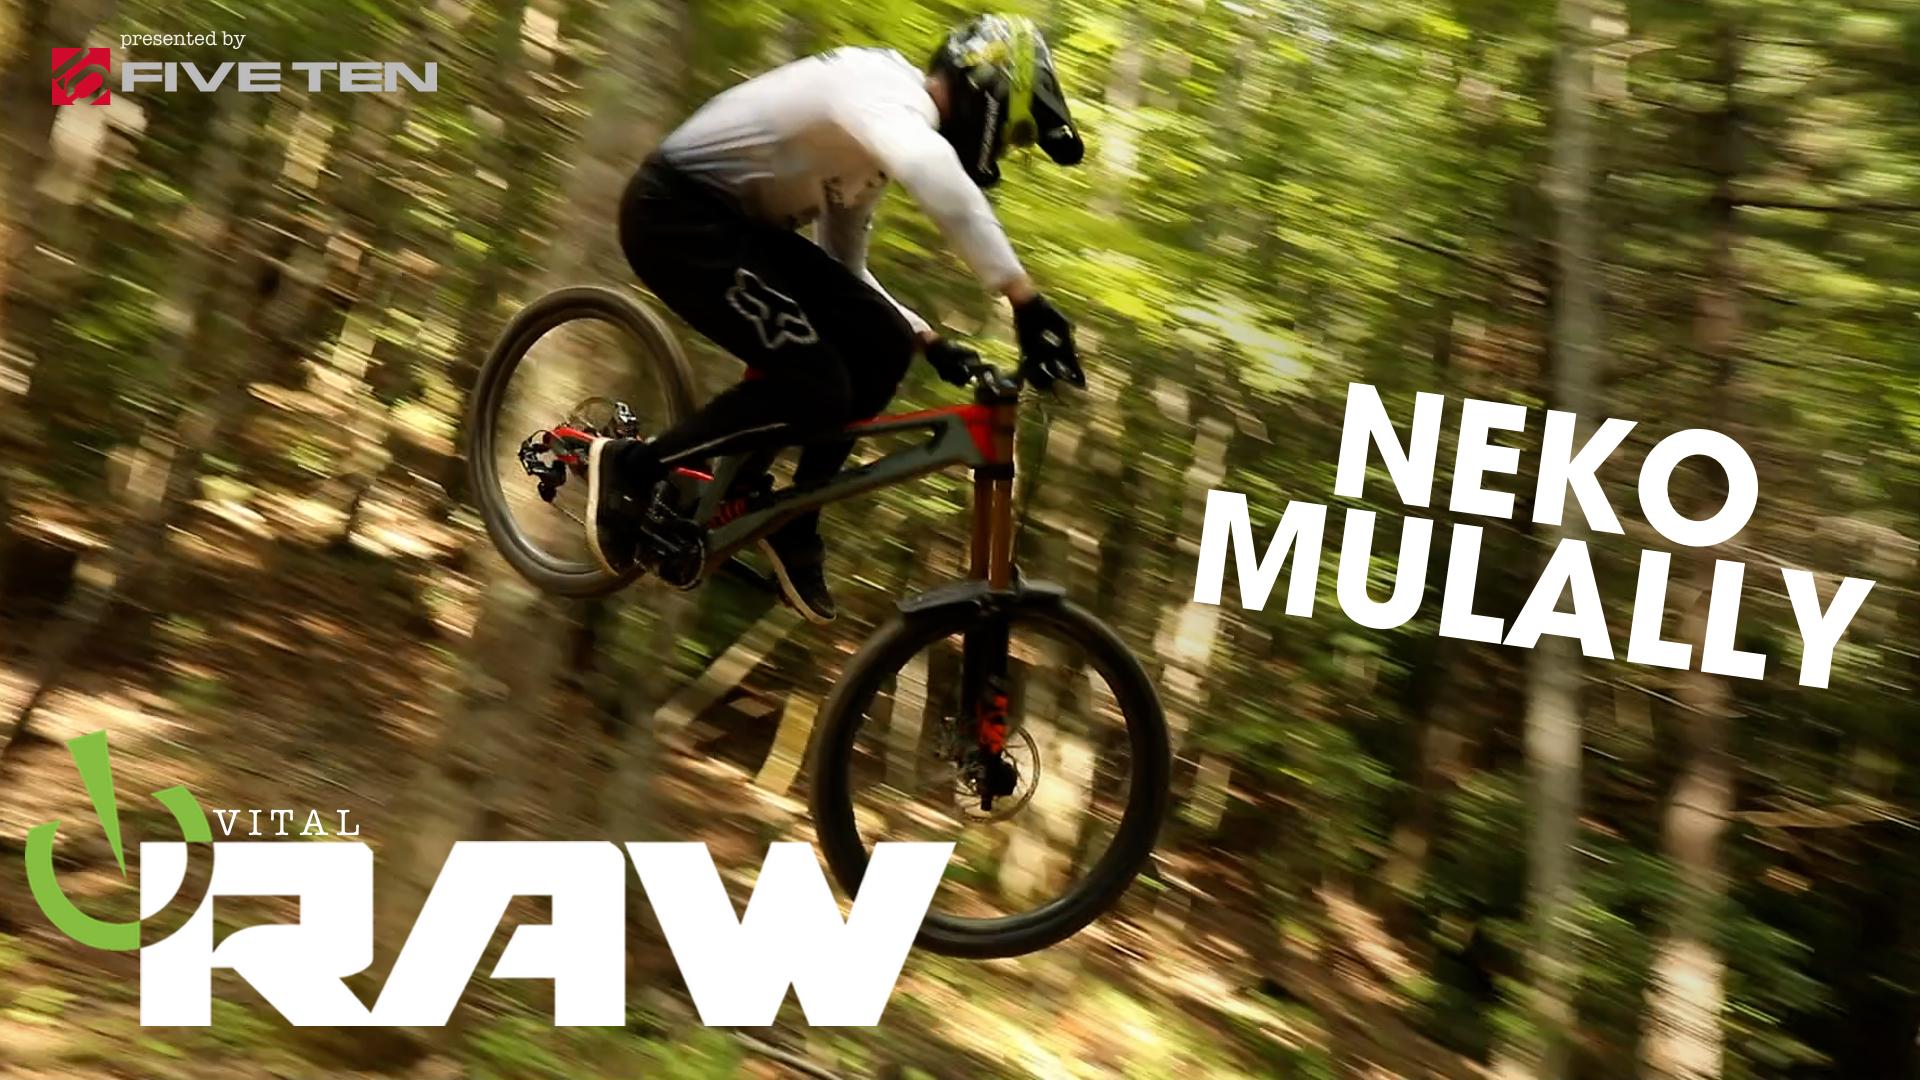 Vital RAW + Bike Check with Neko Mulally